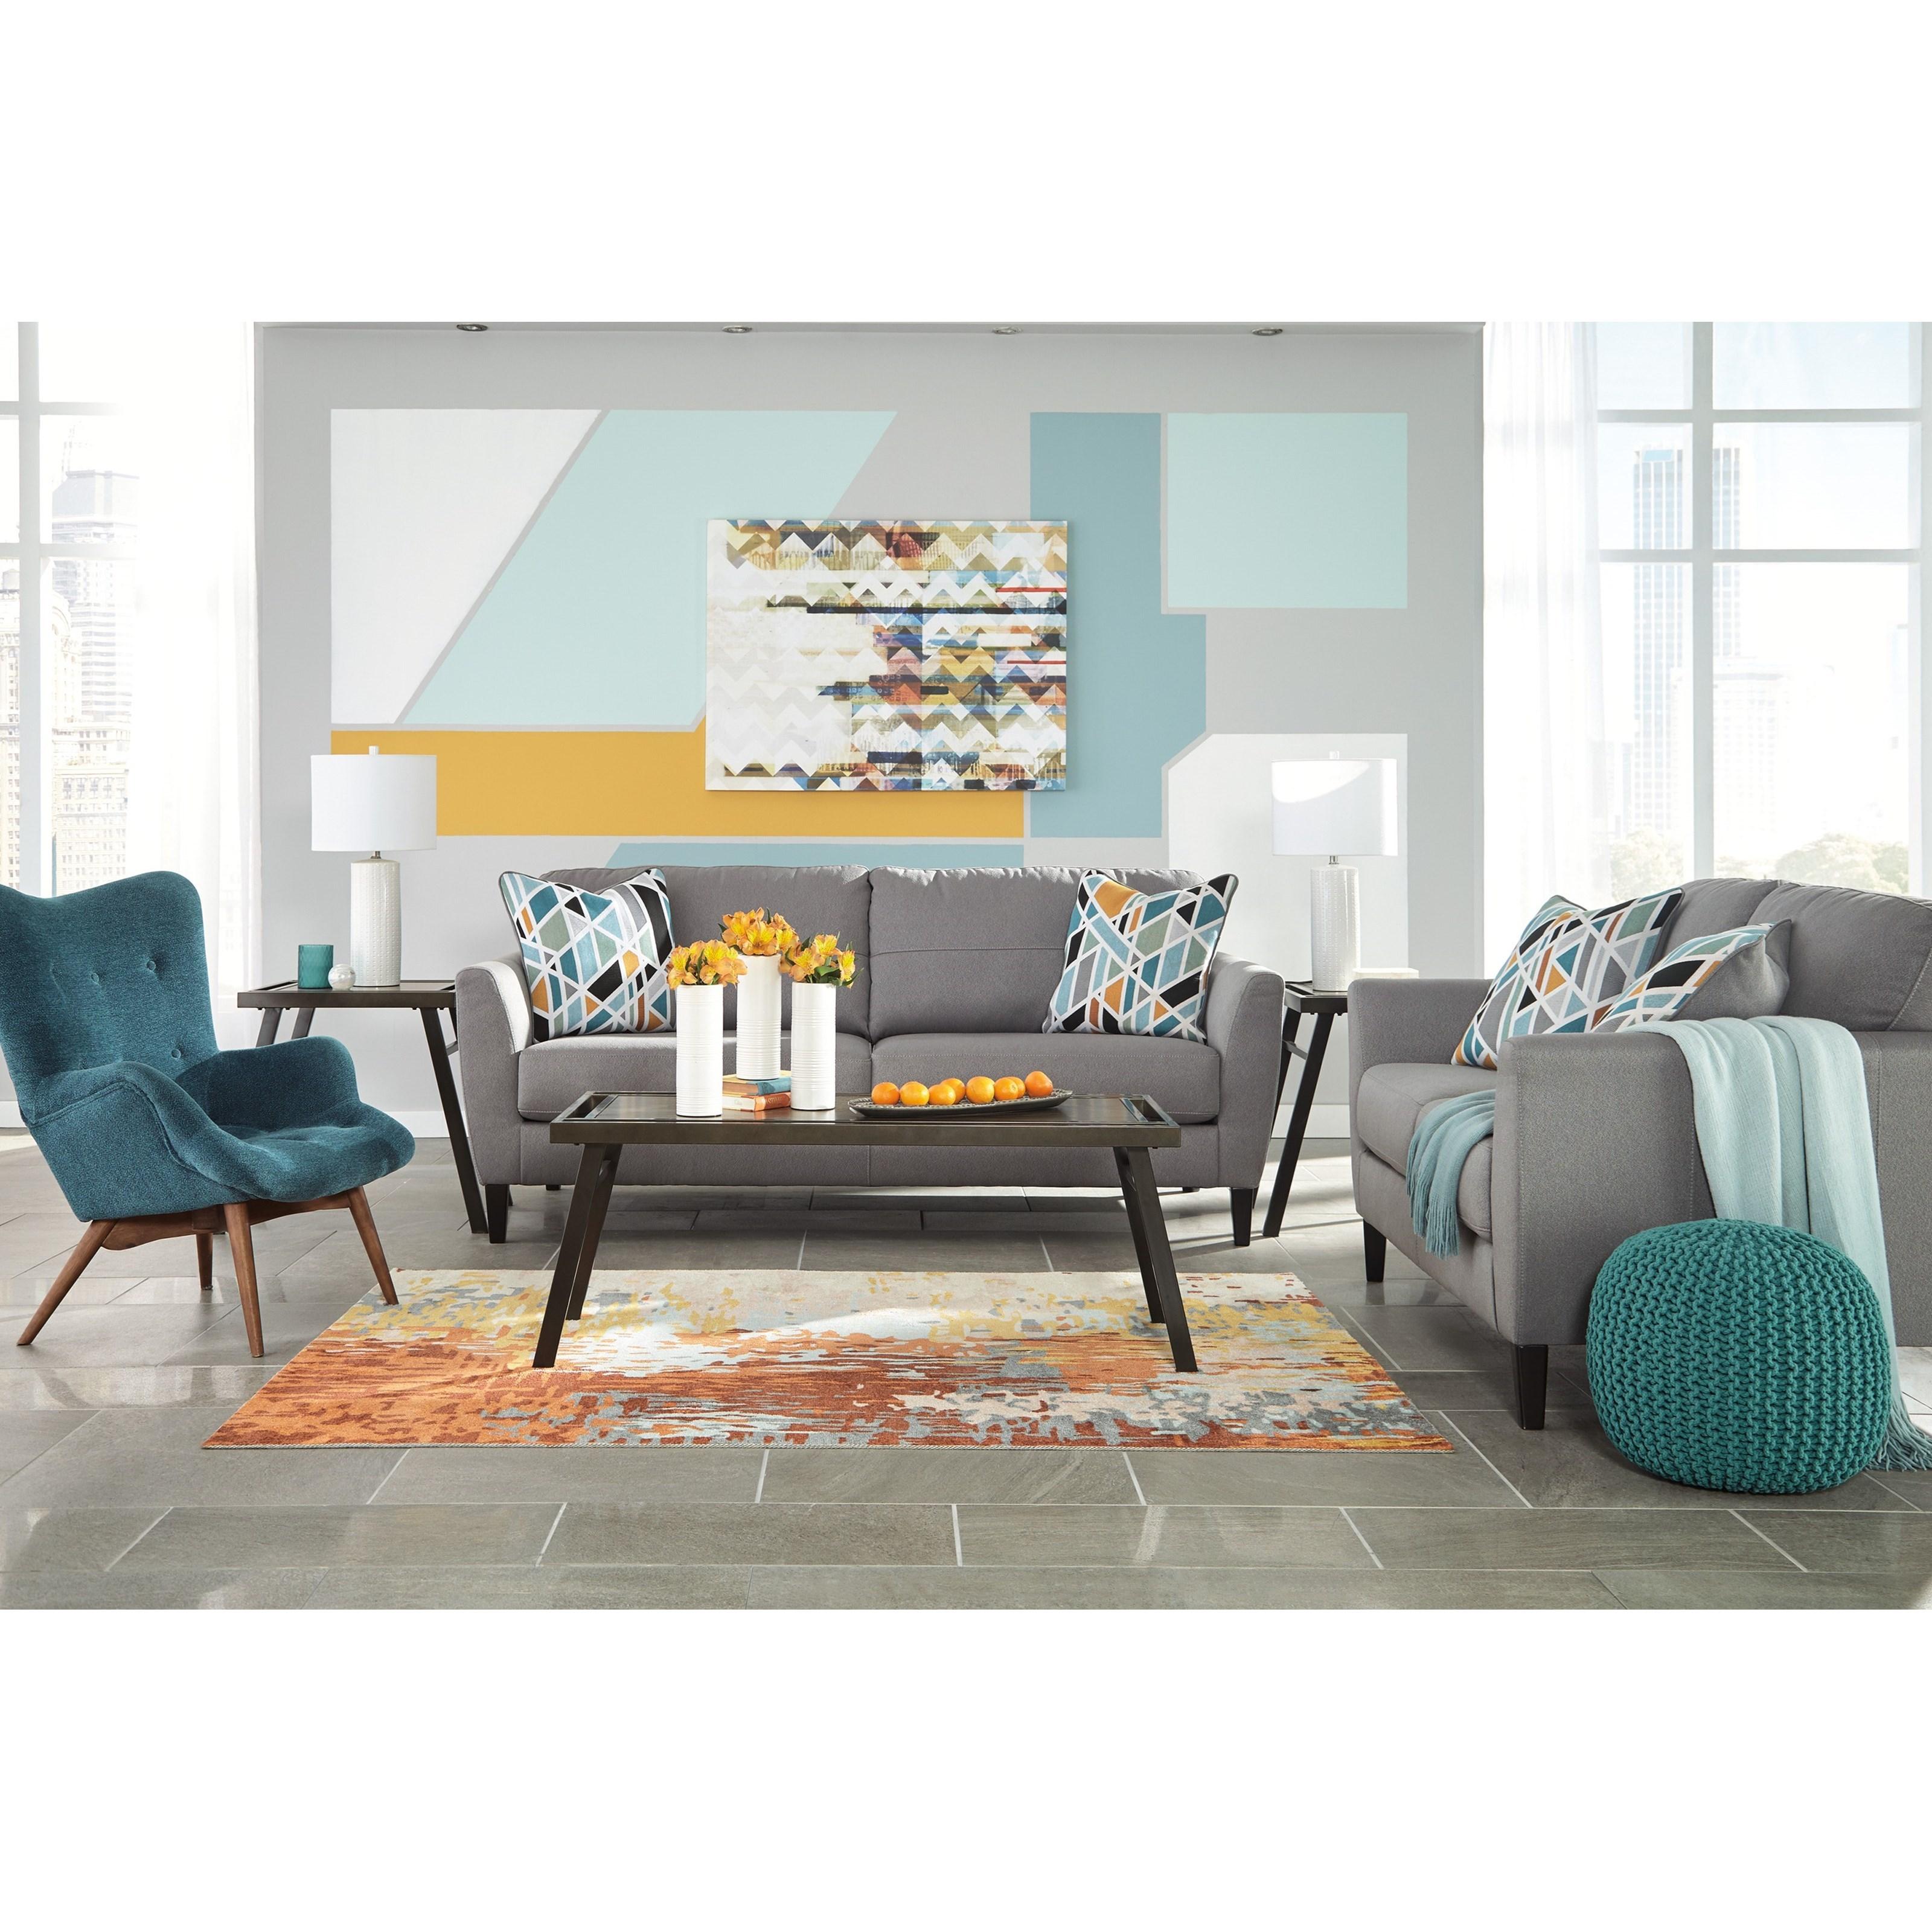 Benchcraft Pelsor Stationary Living Room Group Dunk